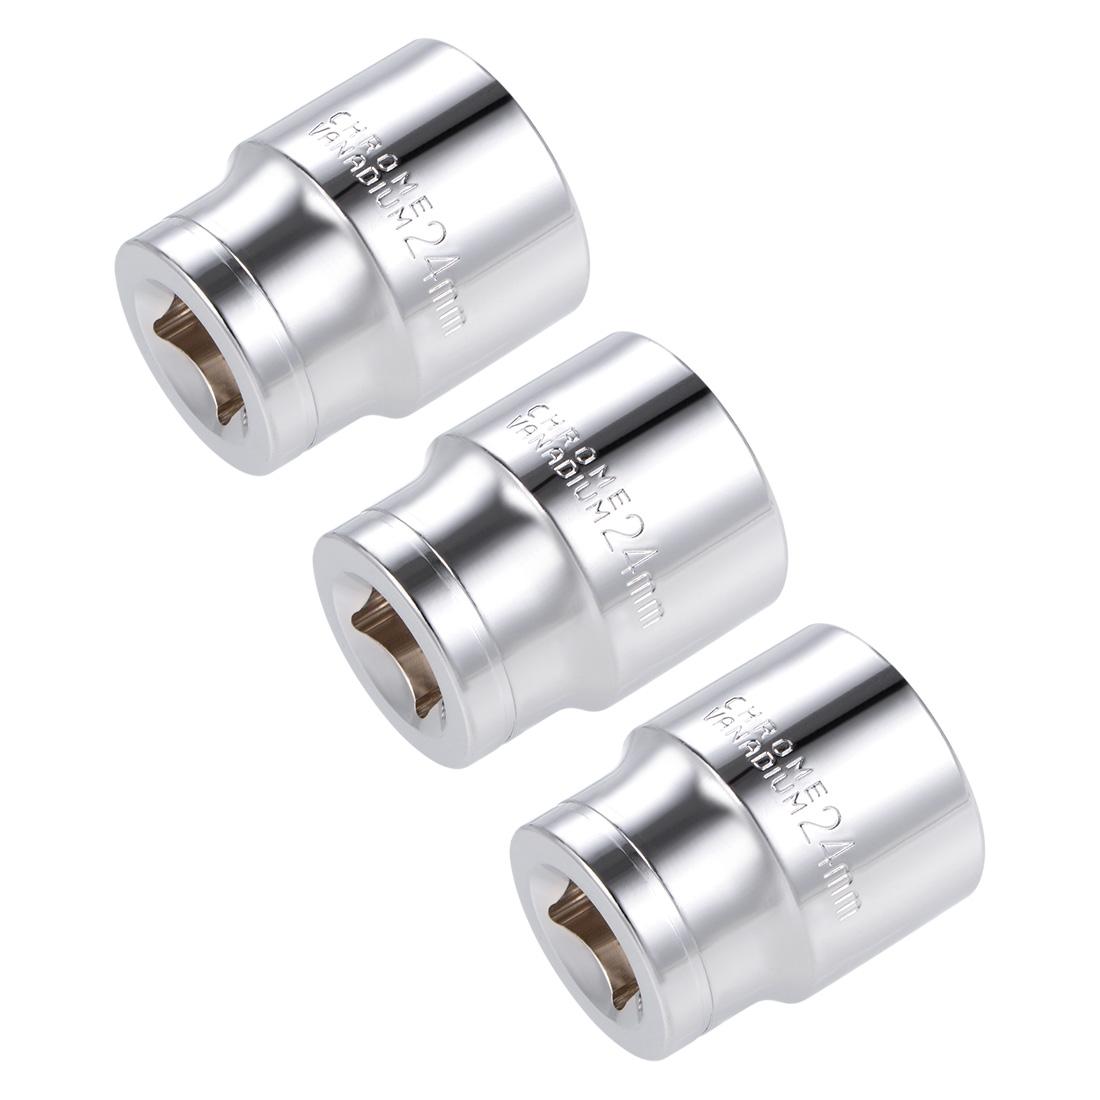 1/2-inch Drive E24 Universal Spline Socket Shallow 12 Point Cr-V Steel 3 pcs